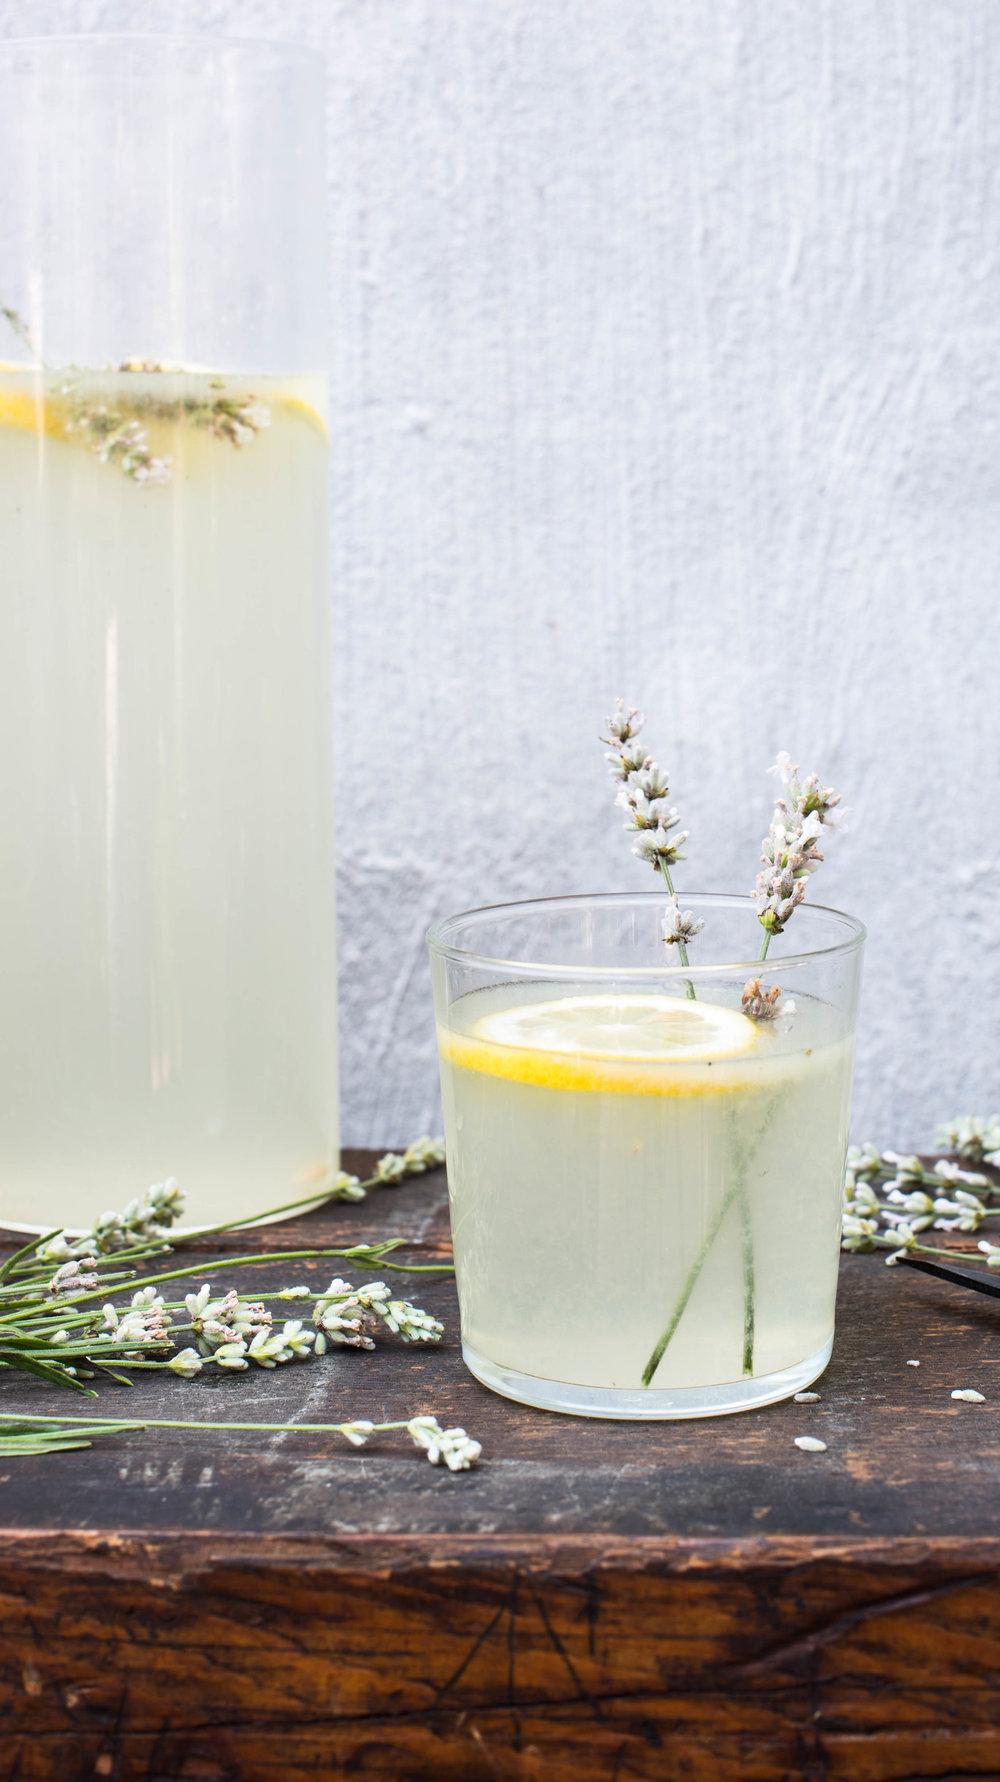 ROSE+&+IVY+Journal+Lavender+Lemonade.jpeg